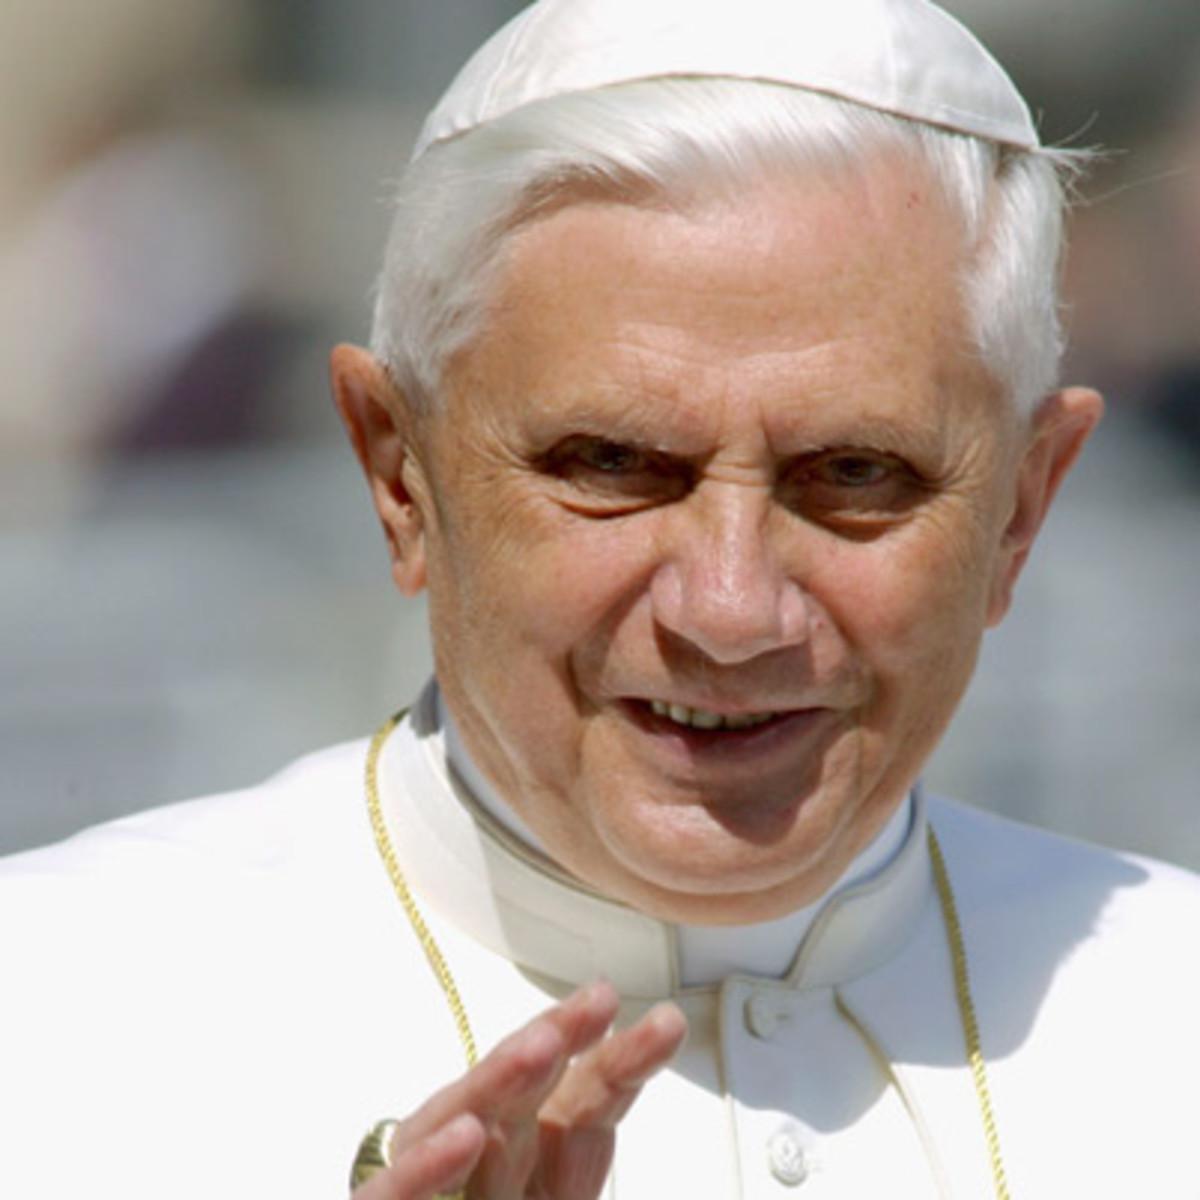 Papa Benedetto XVI: Joseph Aloisius Ratzinger